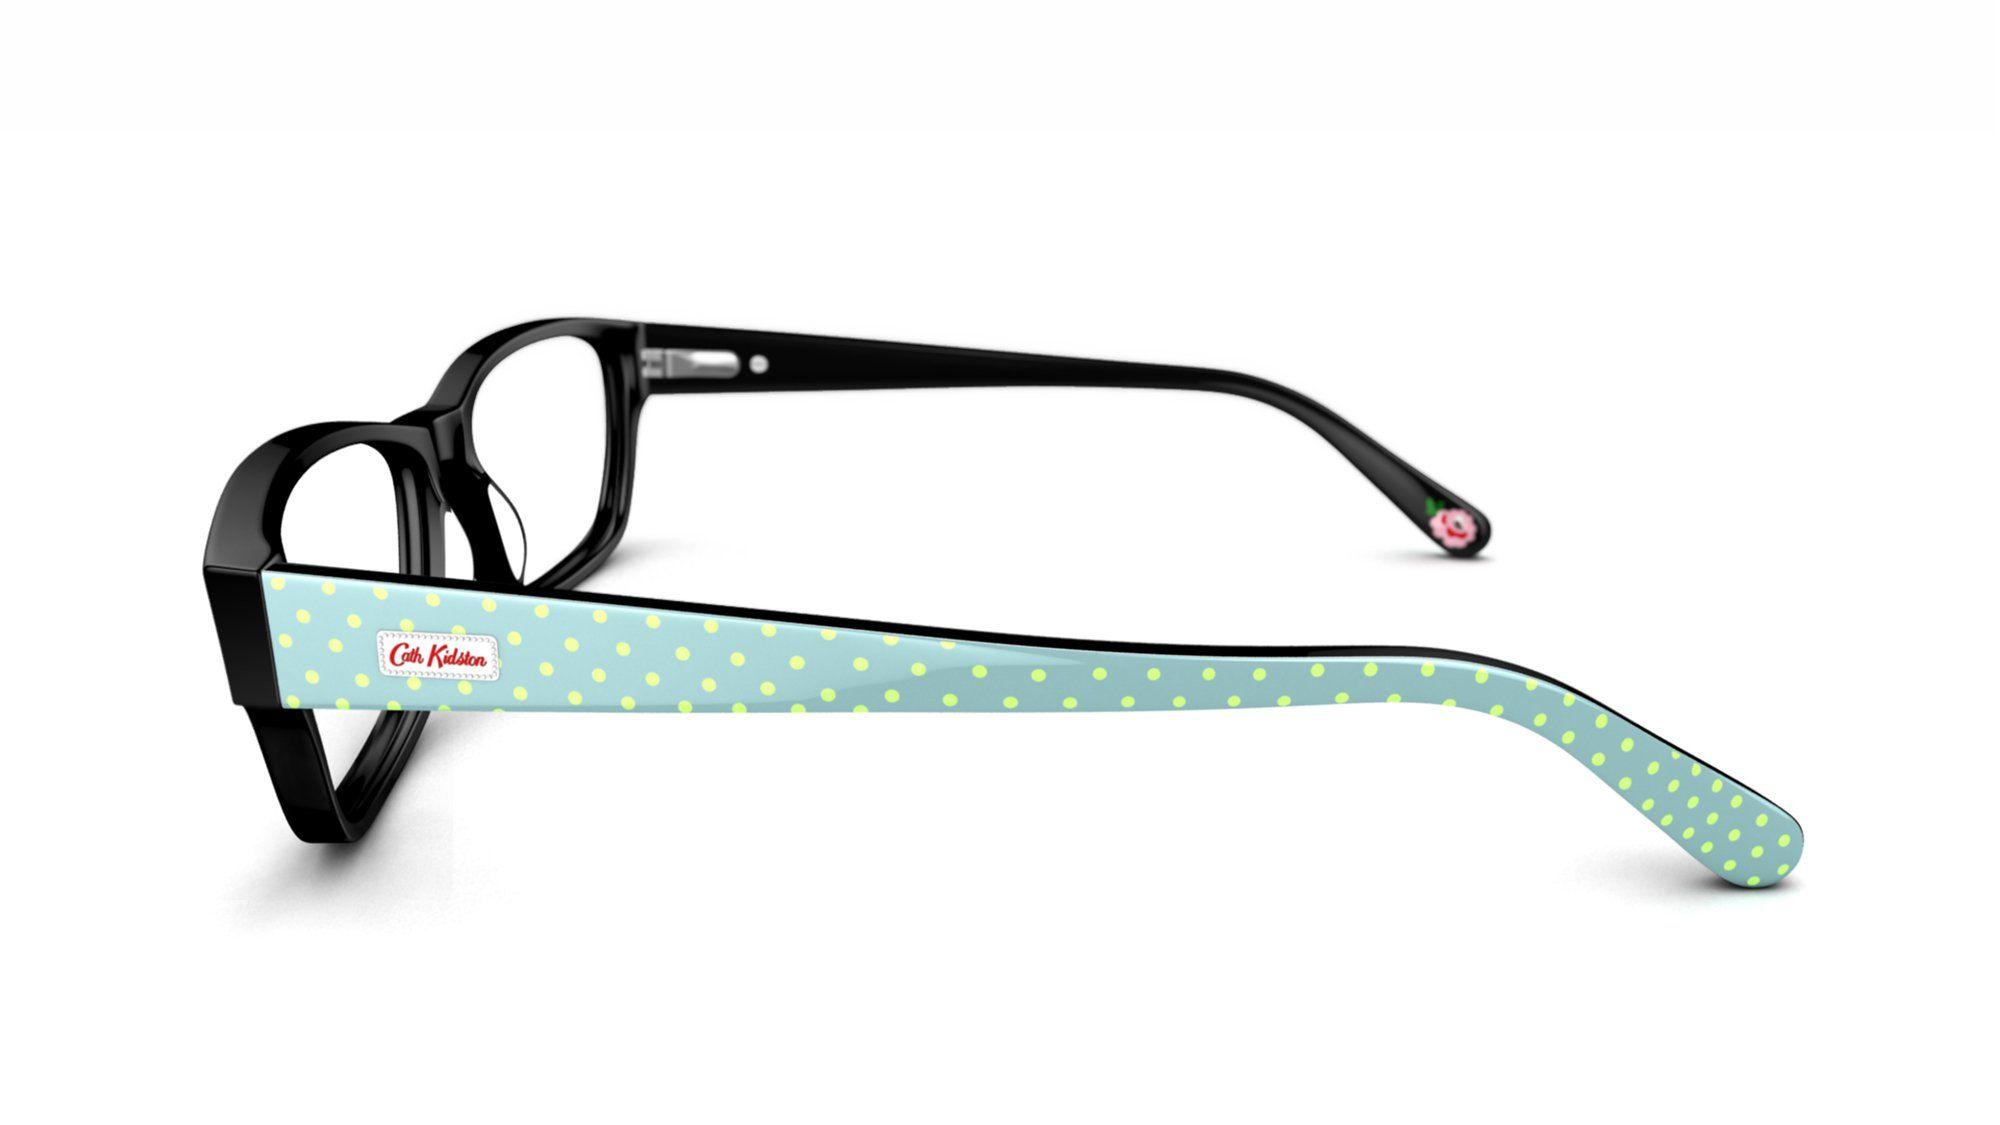 fd1fd4a4a82 Cath Kidston glasses - CATH KIDSTON 03